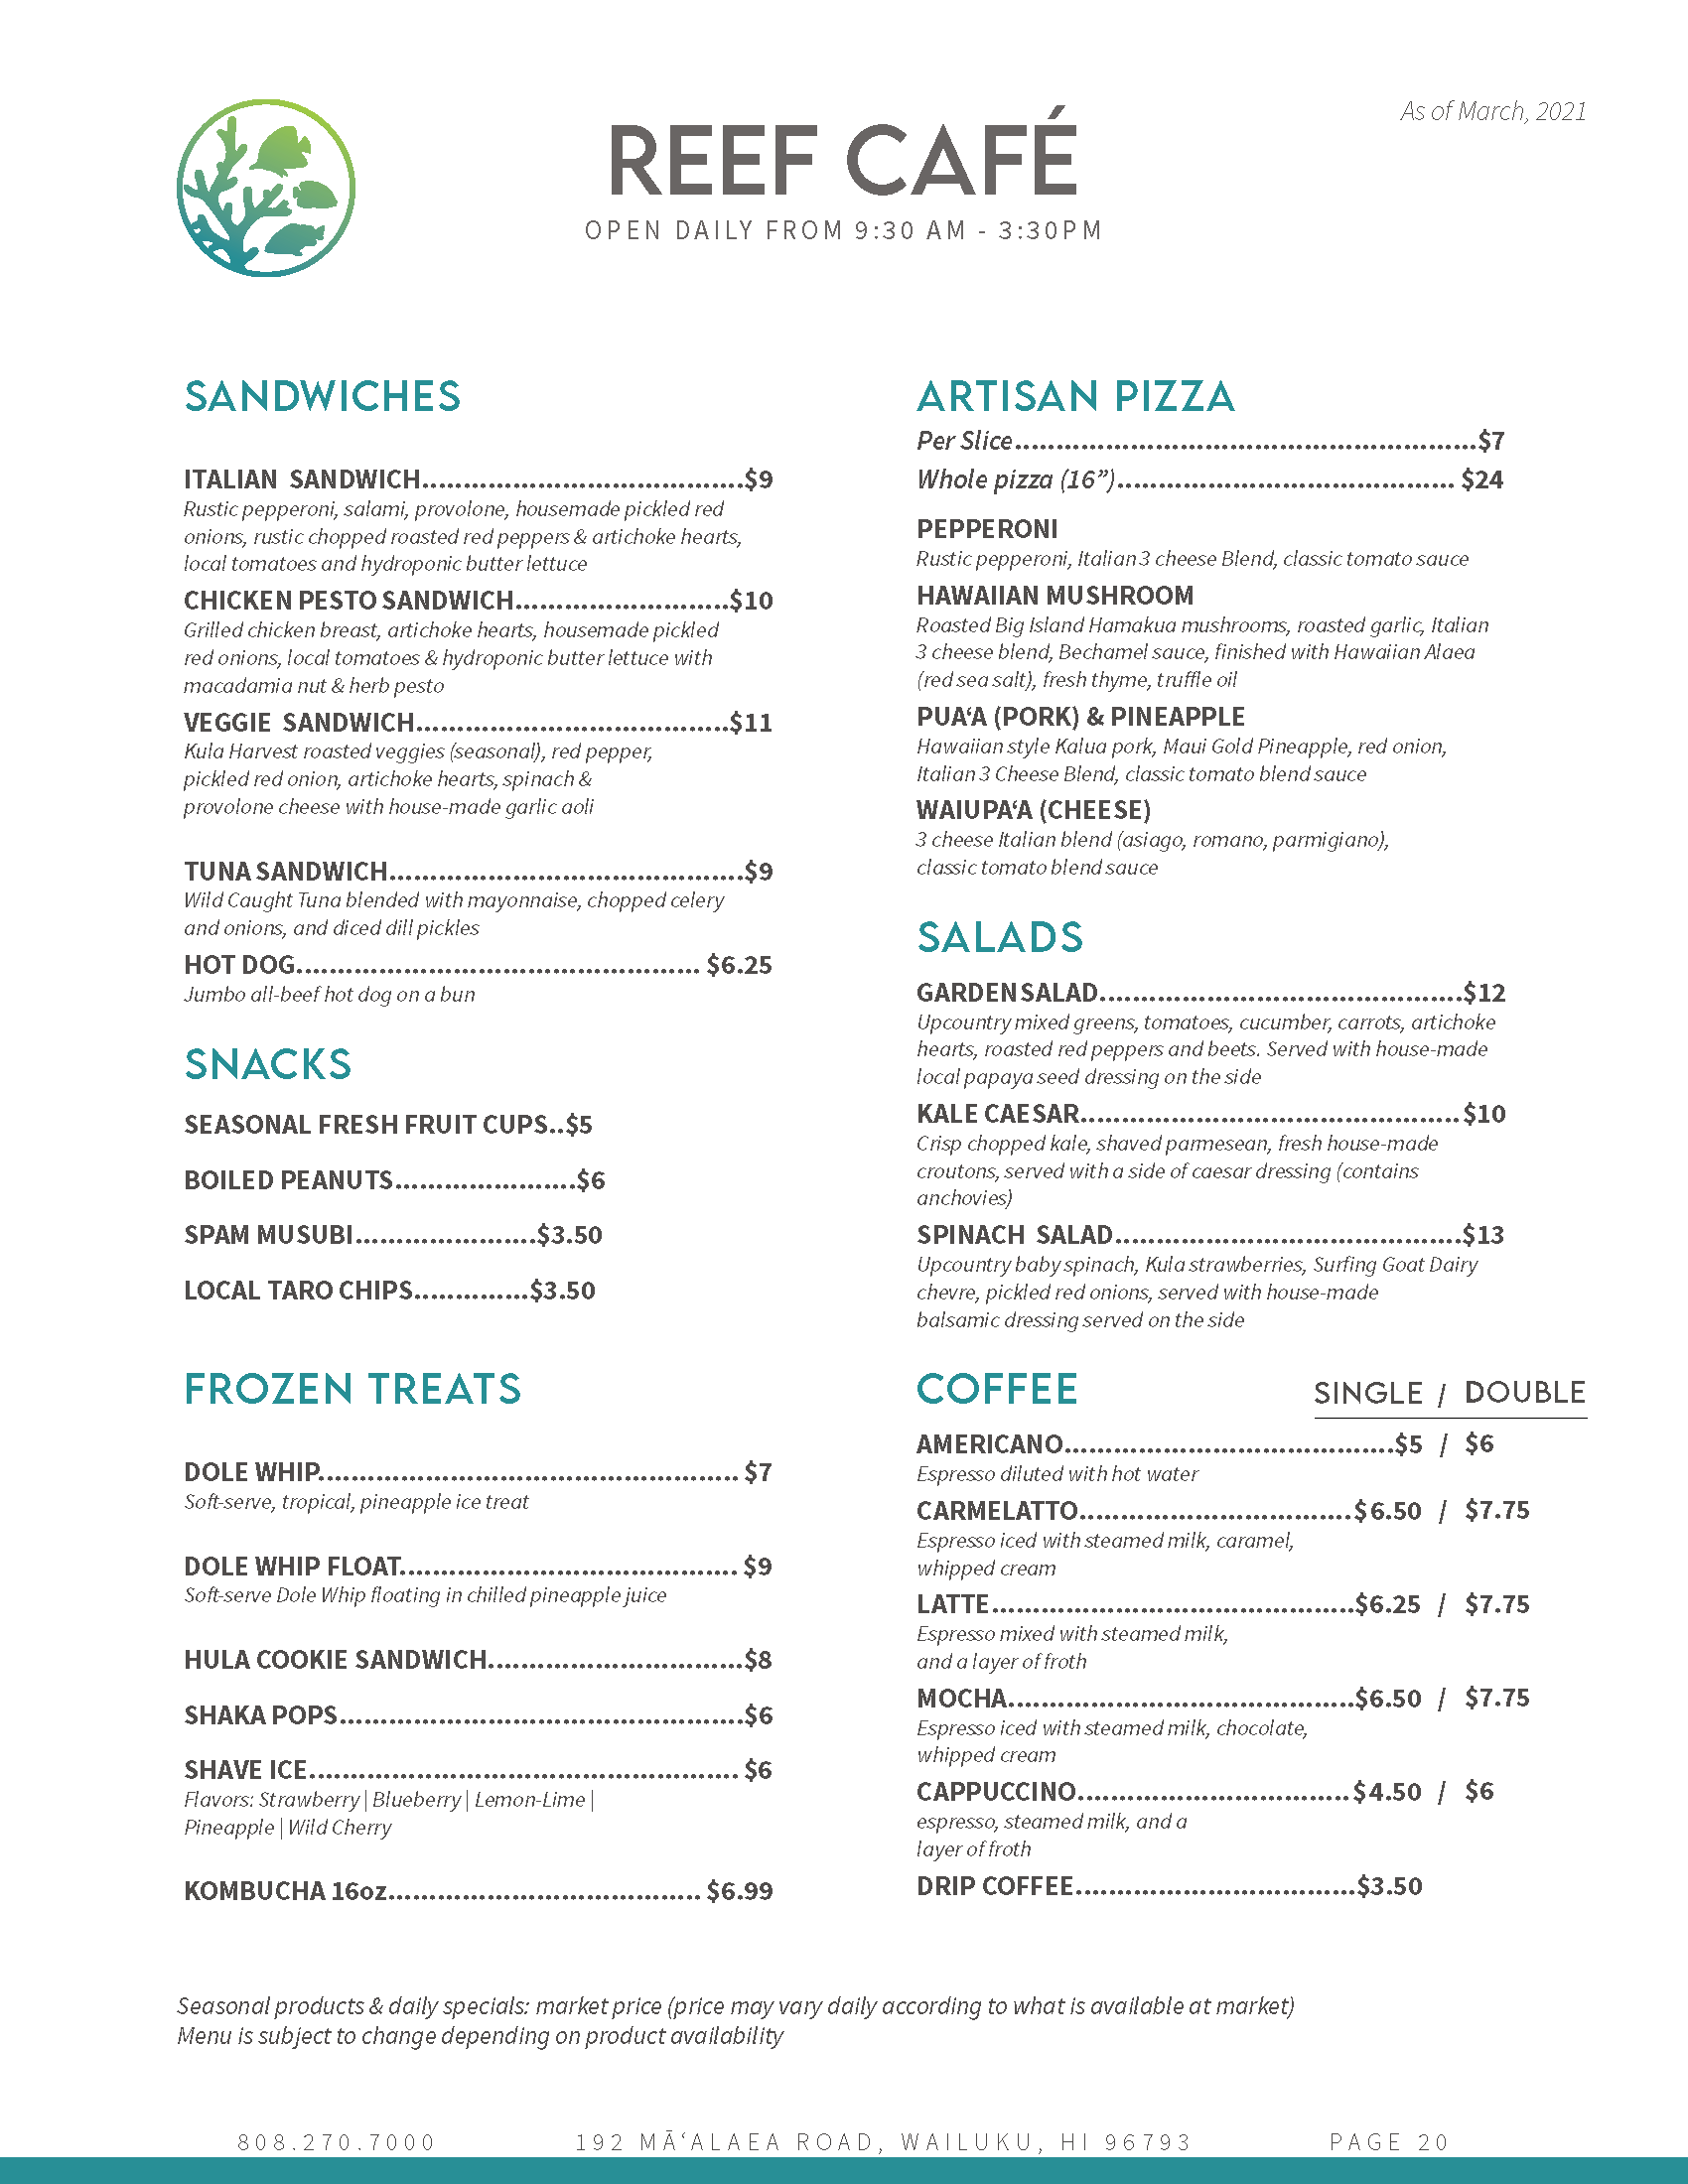 Reef Cafe menu